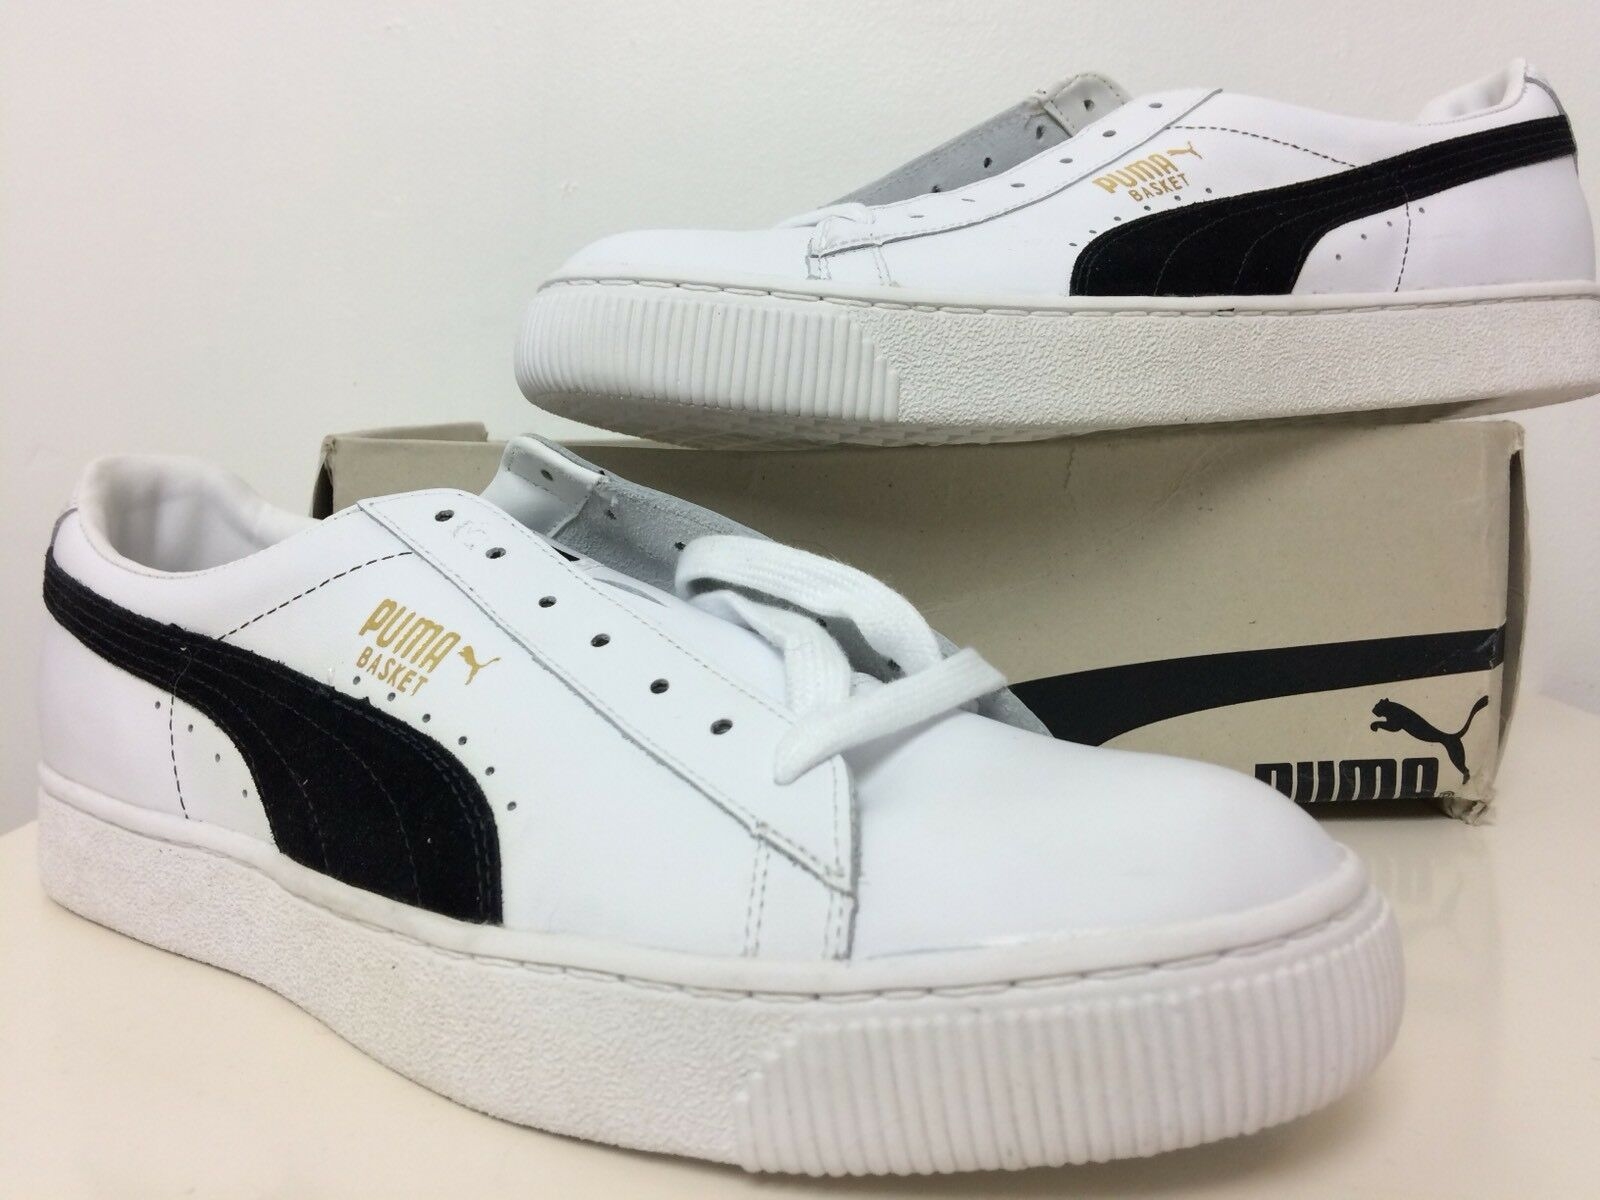 NEW IN BOX PUMA Men's White & Black BASKET Low Top Sneaker Size US 13